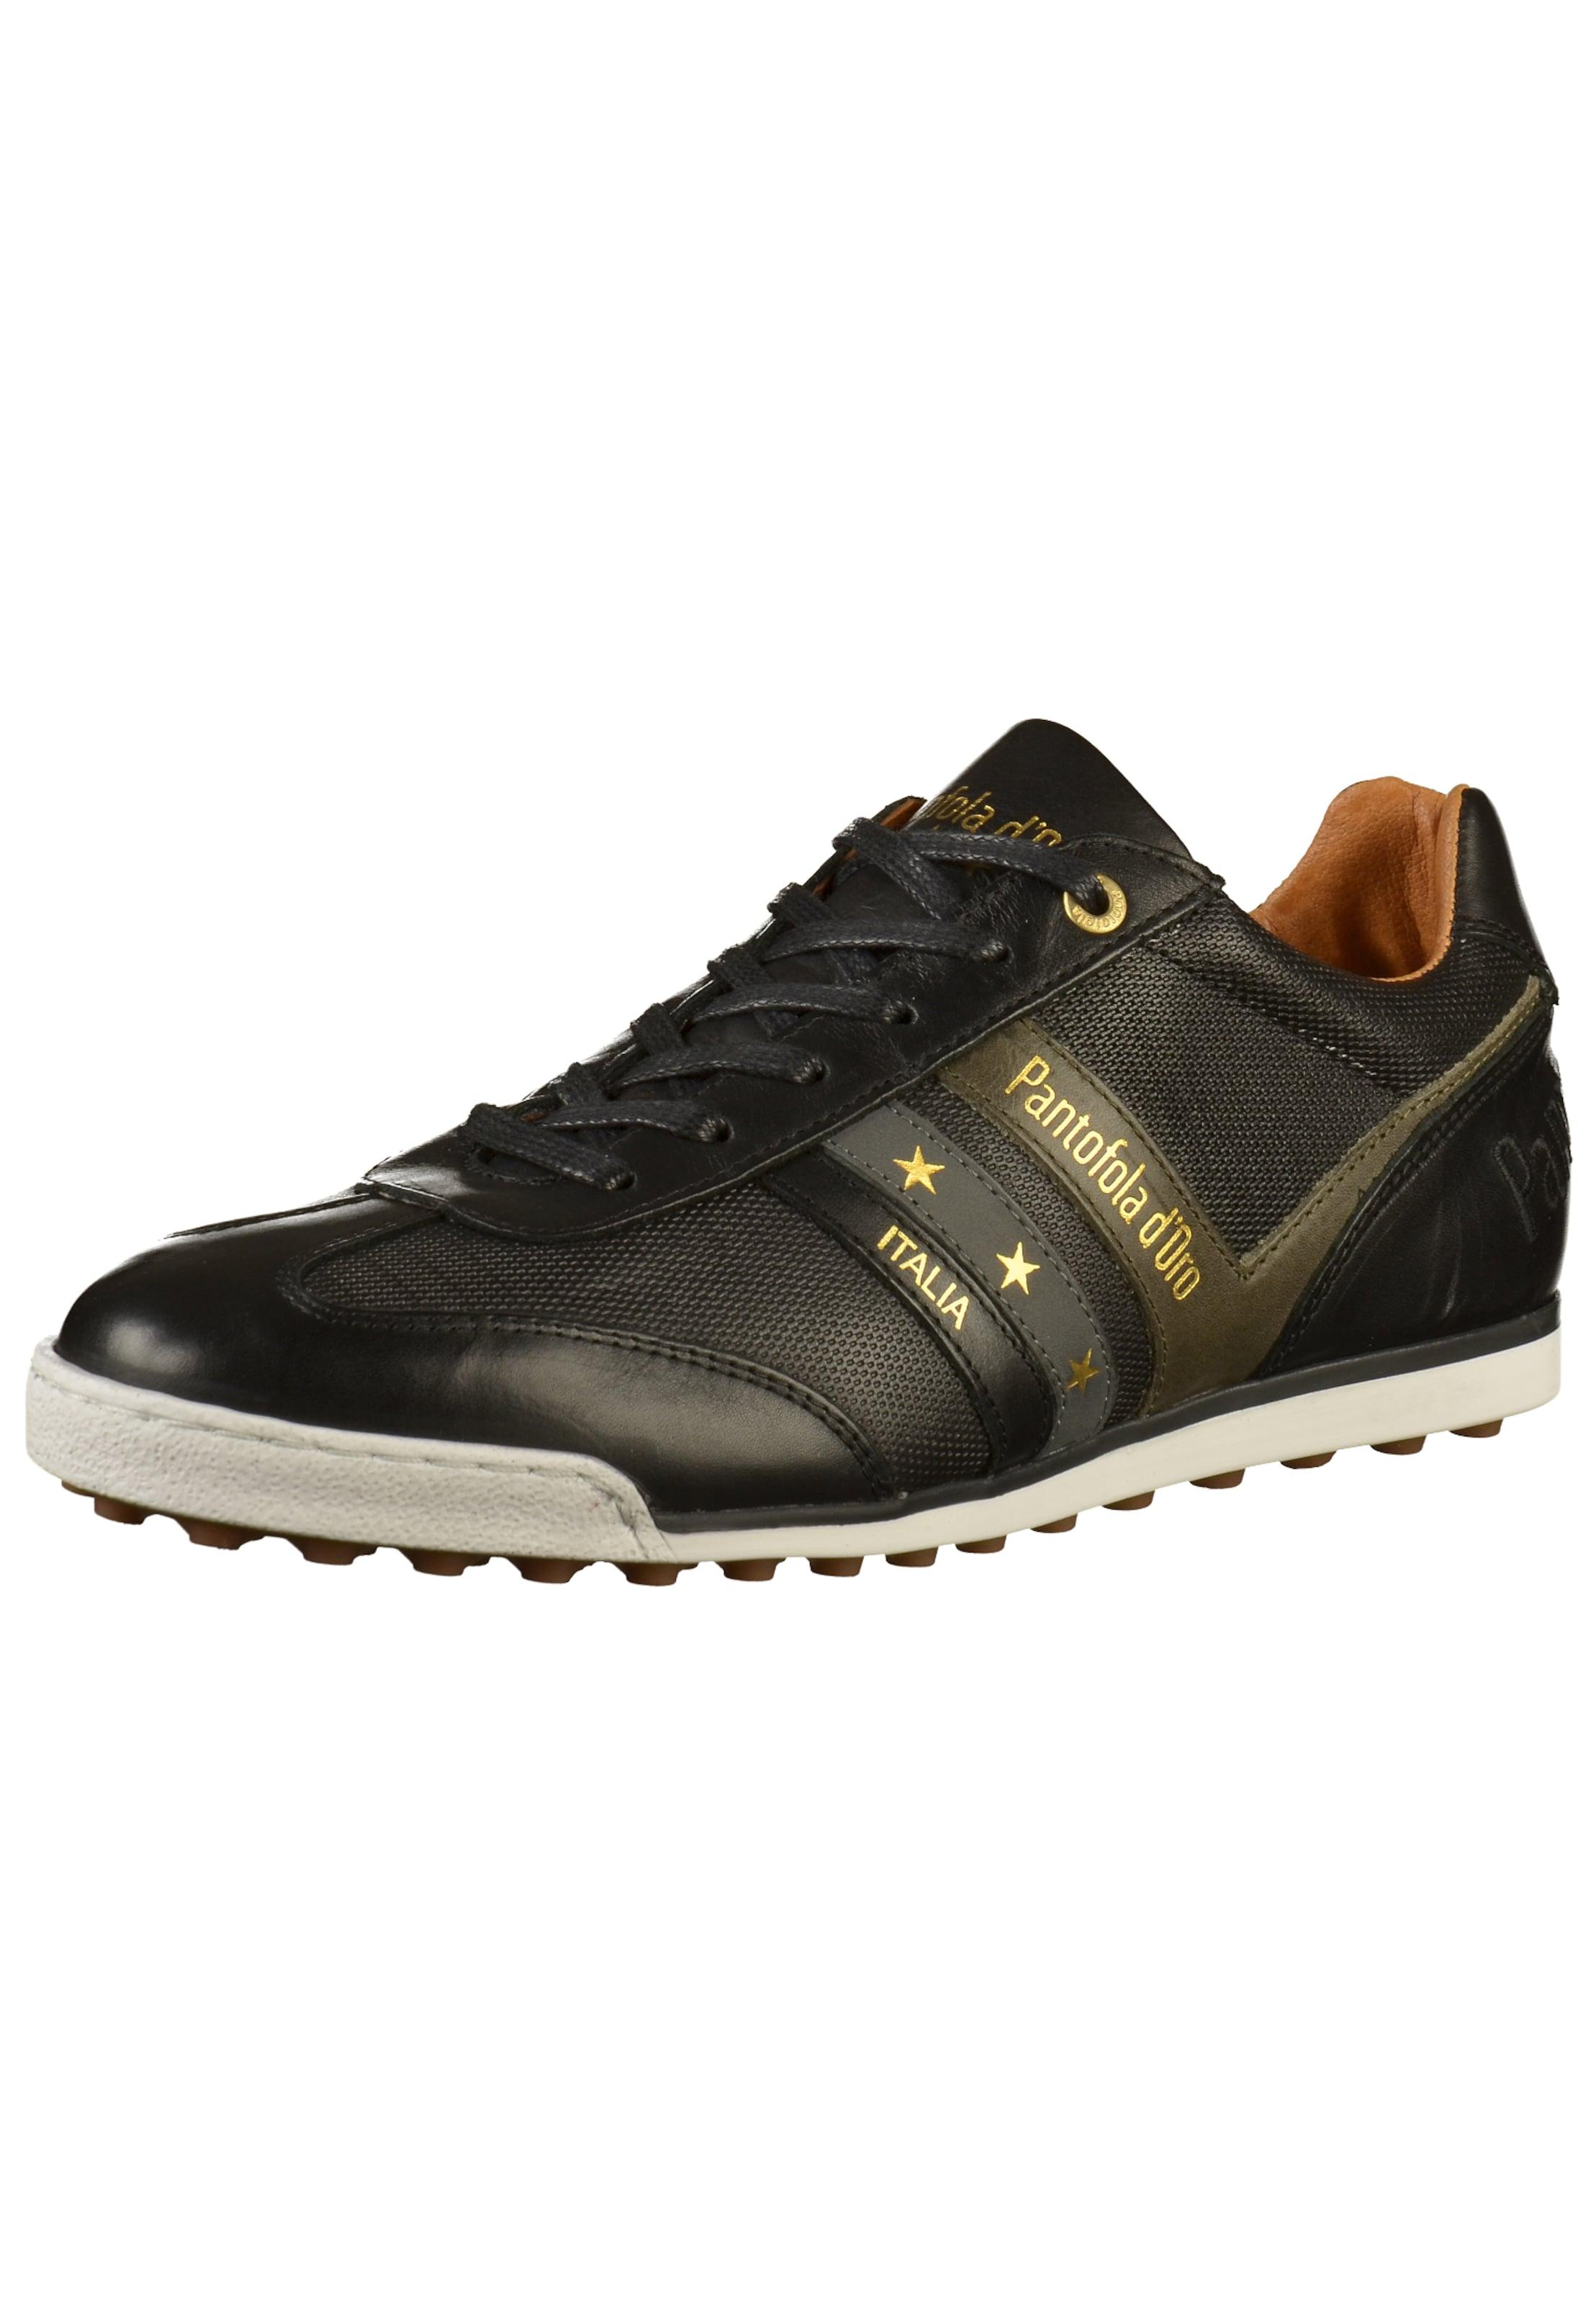 PANTOFOLA D ORO Sneaker Verschleißfeste billige Schuhe